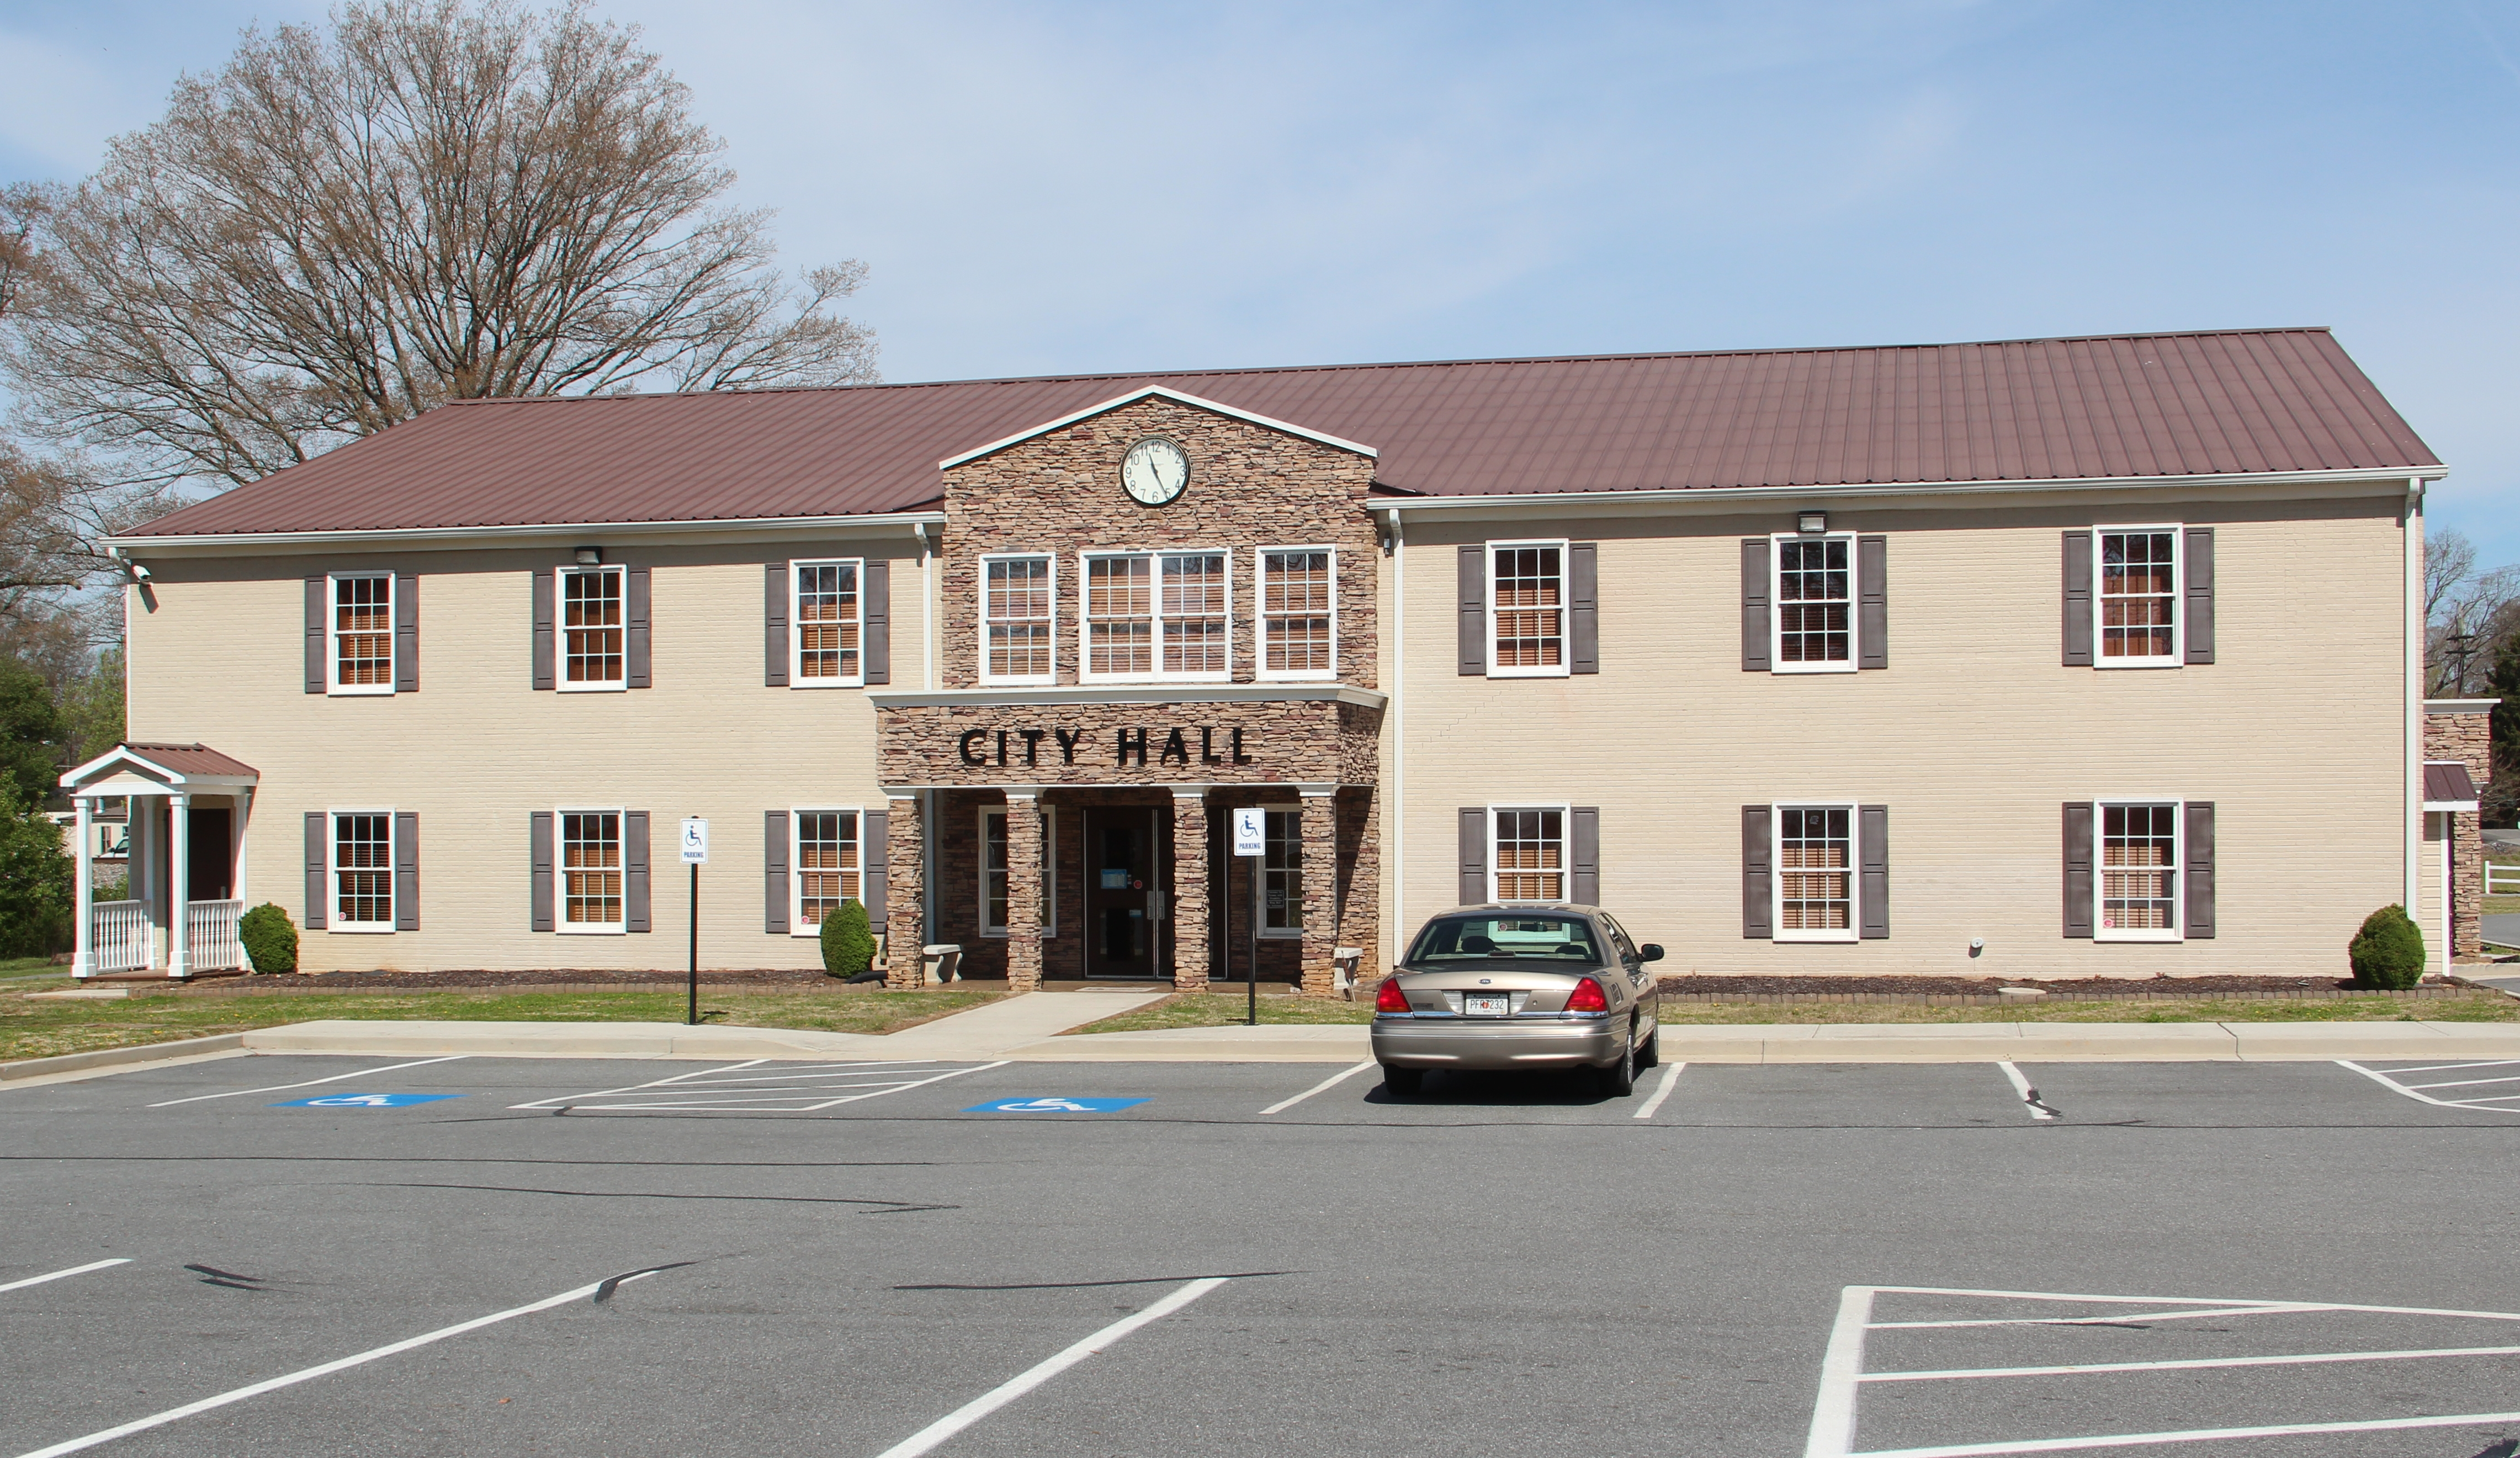 City Hall Cassville Mo